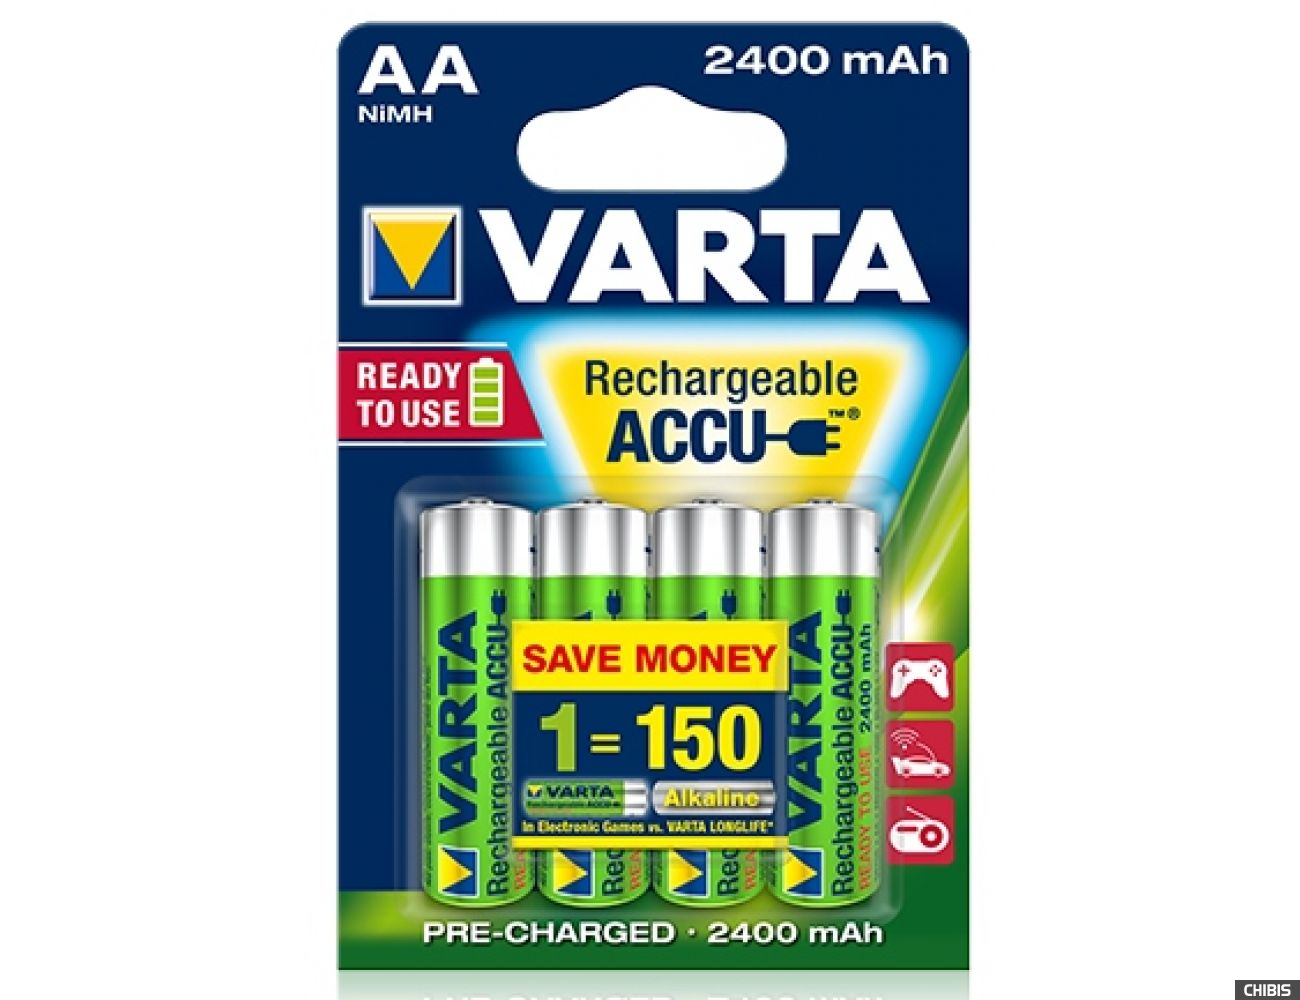 Аккумуляторные батарейки Varta АА 2400 mAh Ni-Mh Ready to Use блистер 4/4 56756101404